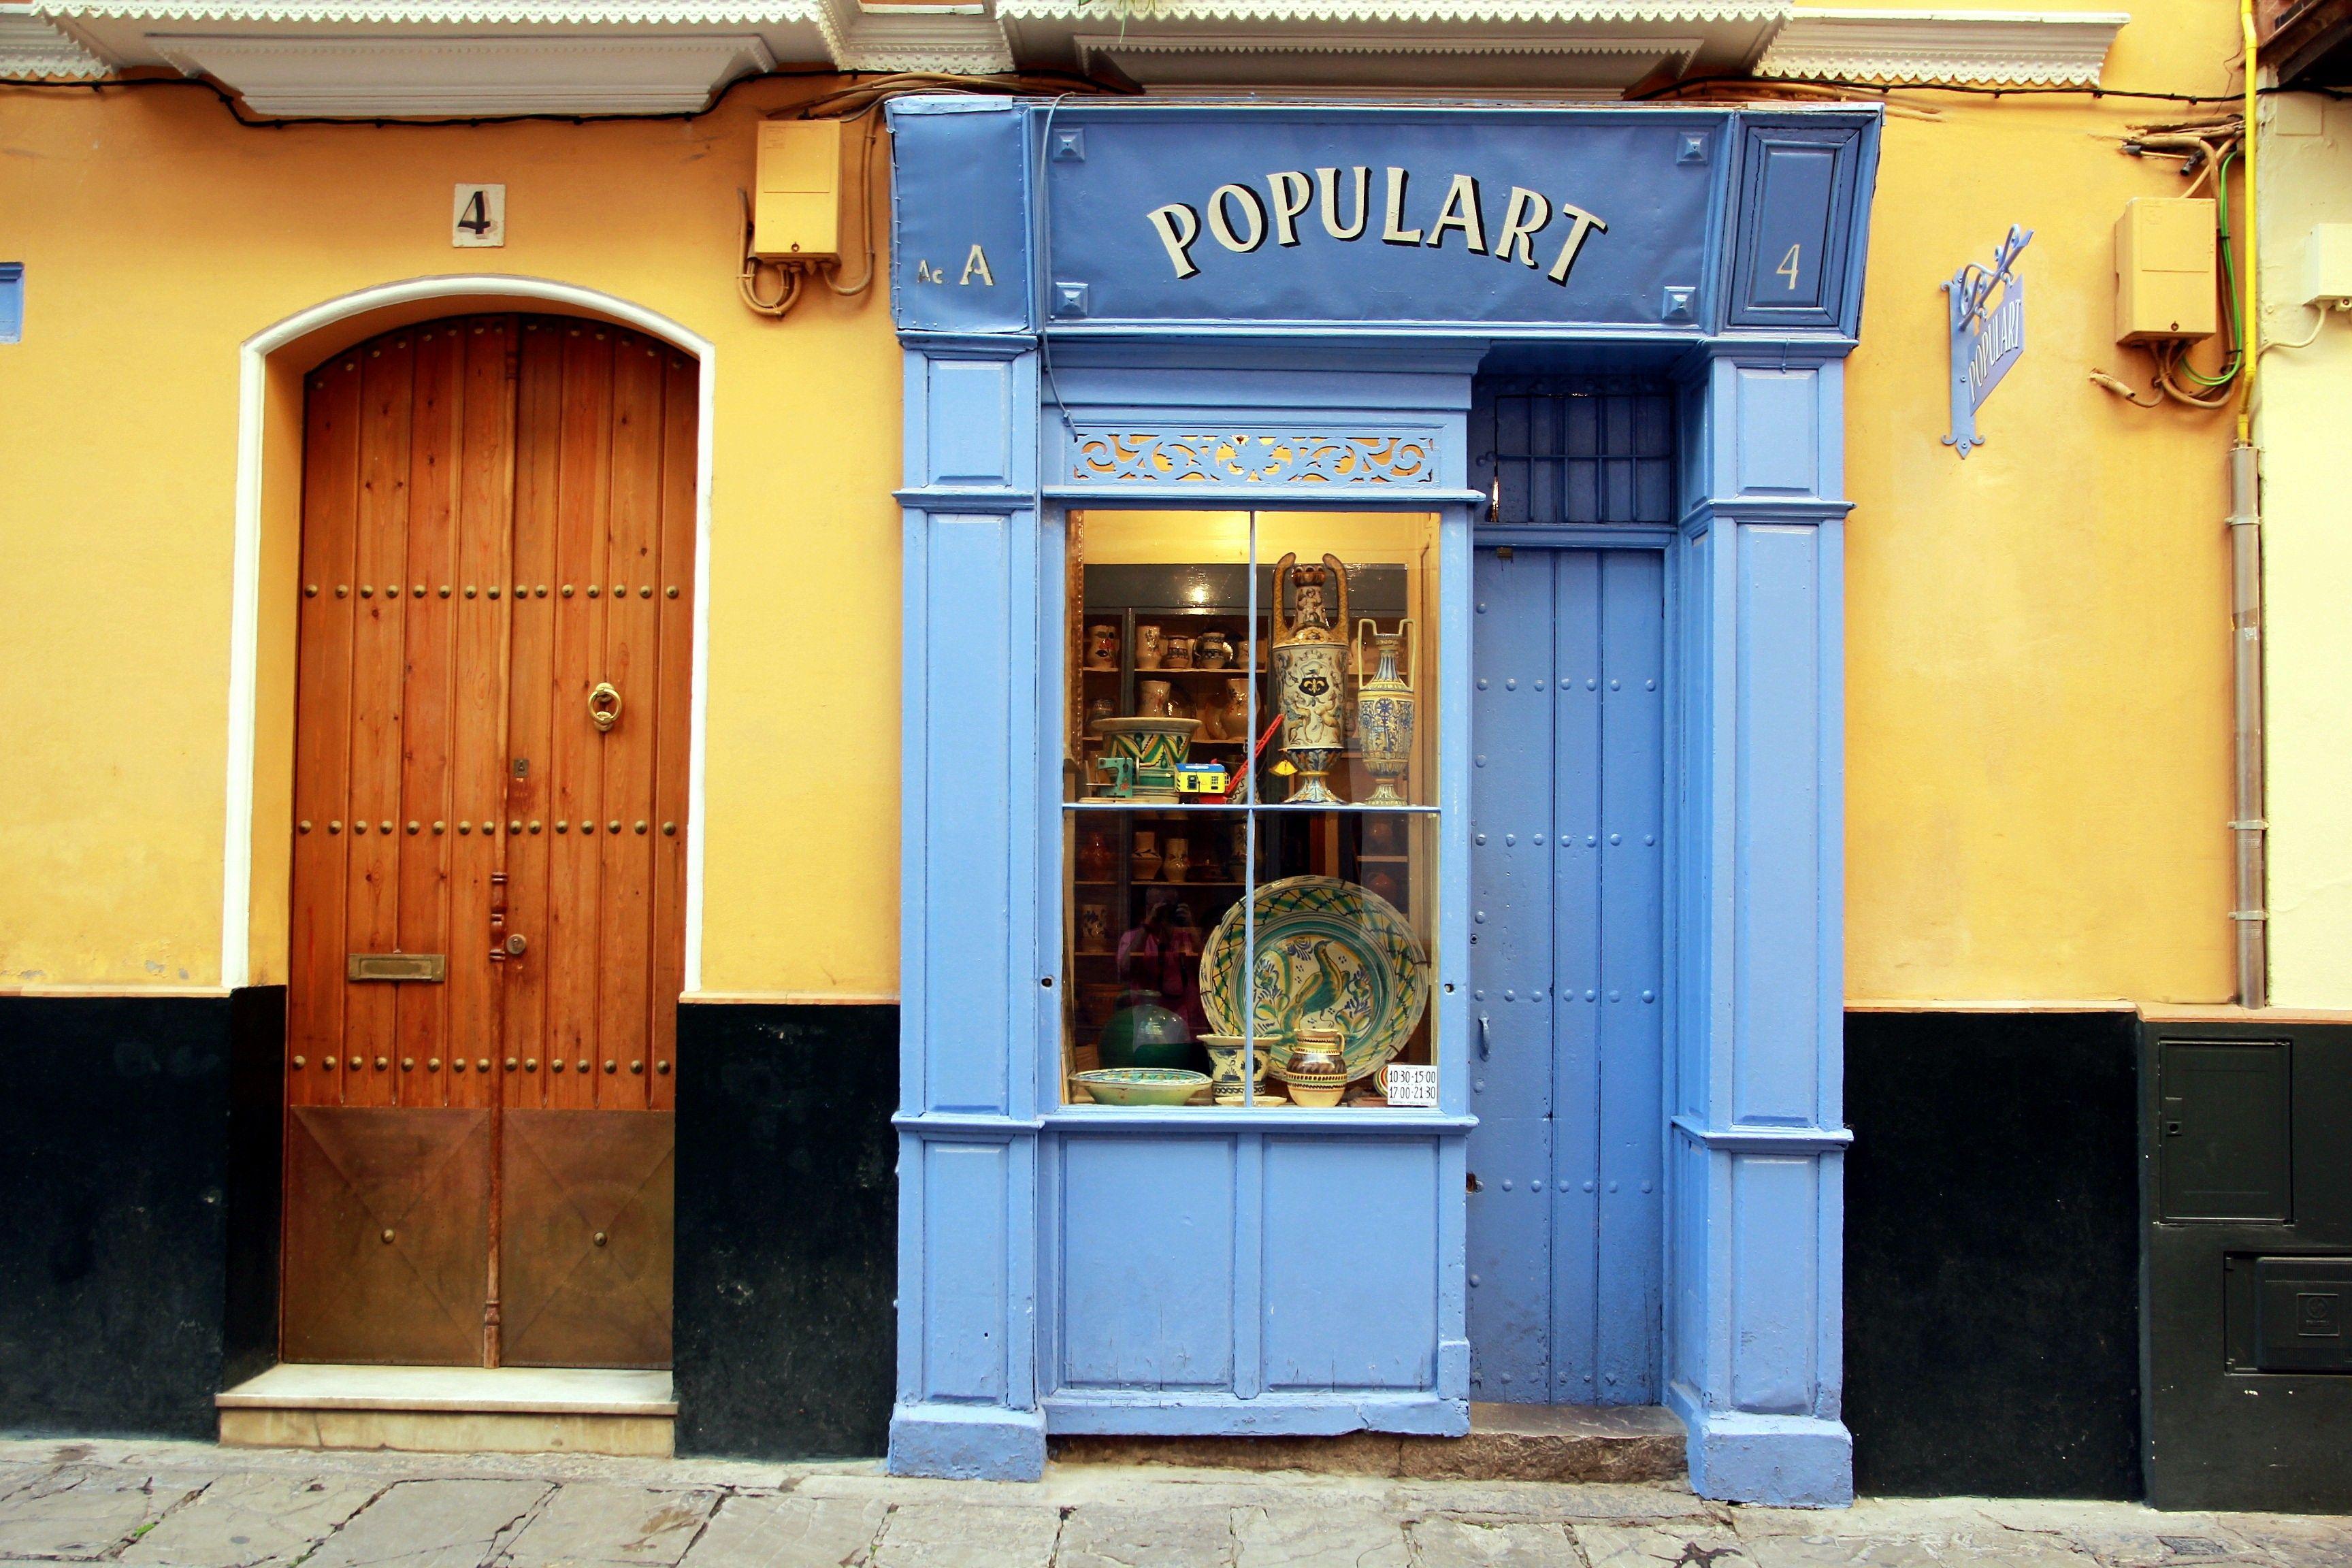 Botiga Populart - Pje. de Vila, 4, Sevilla